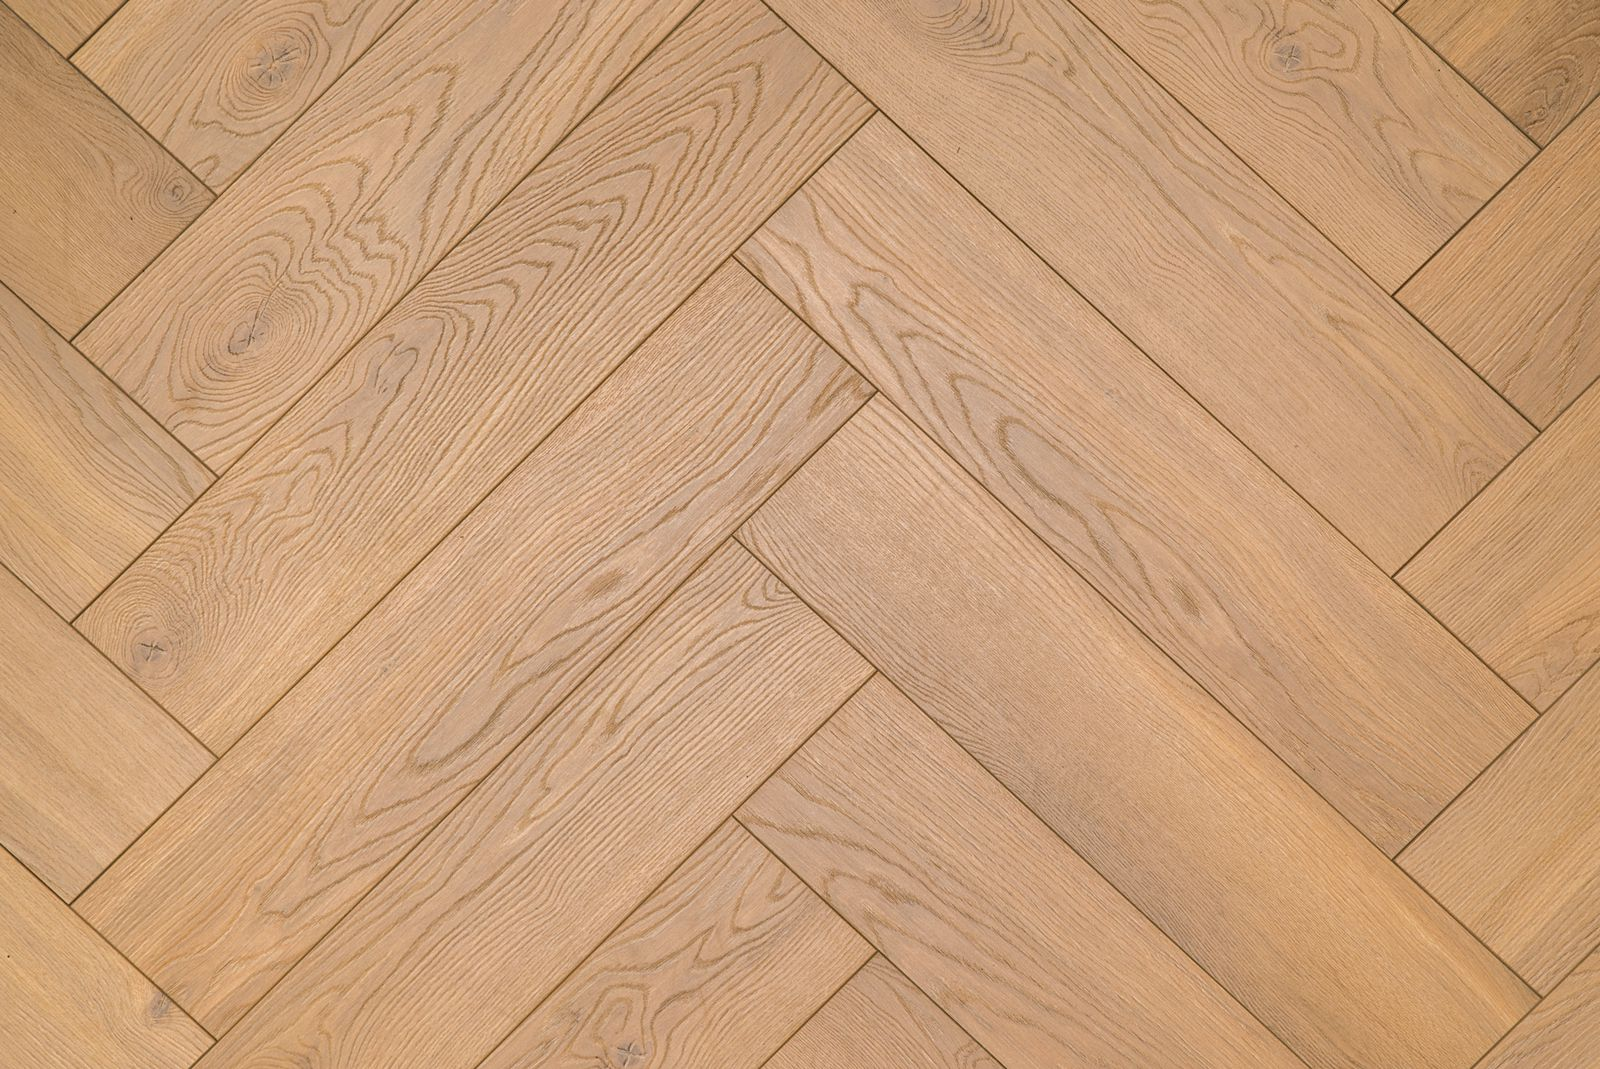 Fesca visgraat laminaat warm eiken vloer patroon eik ac